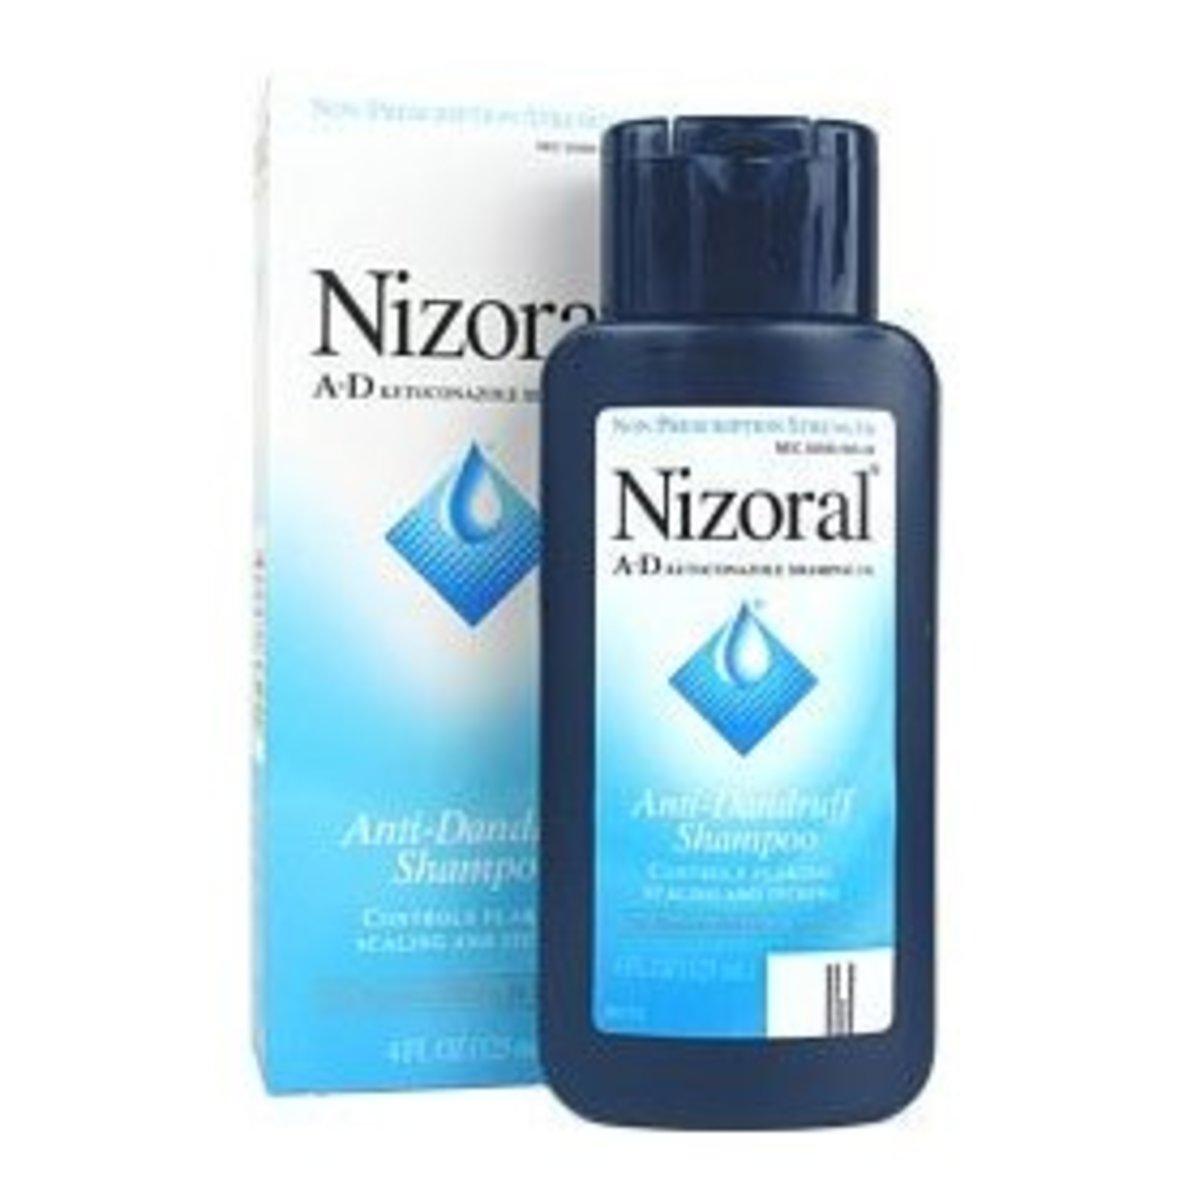 Selsun Blue vs. Head & Shoulders vs. Nizoral: Best Dandruff Shampoo